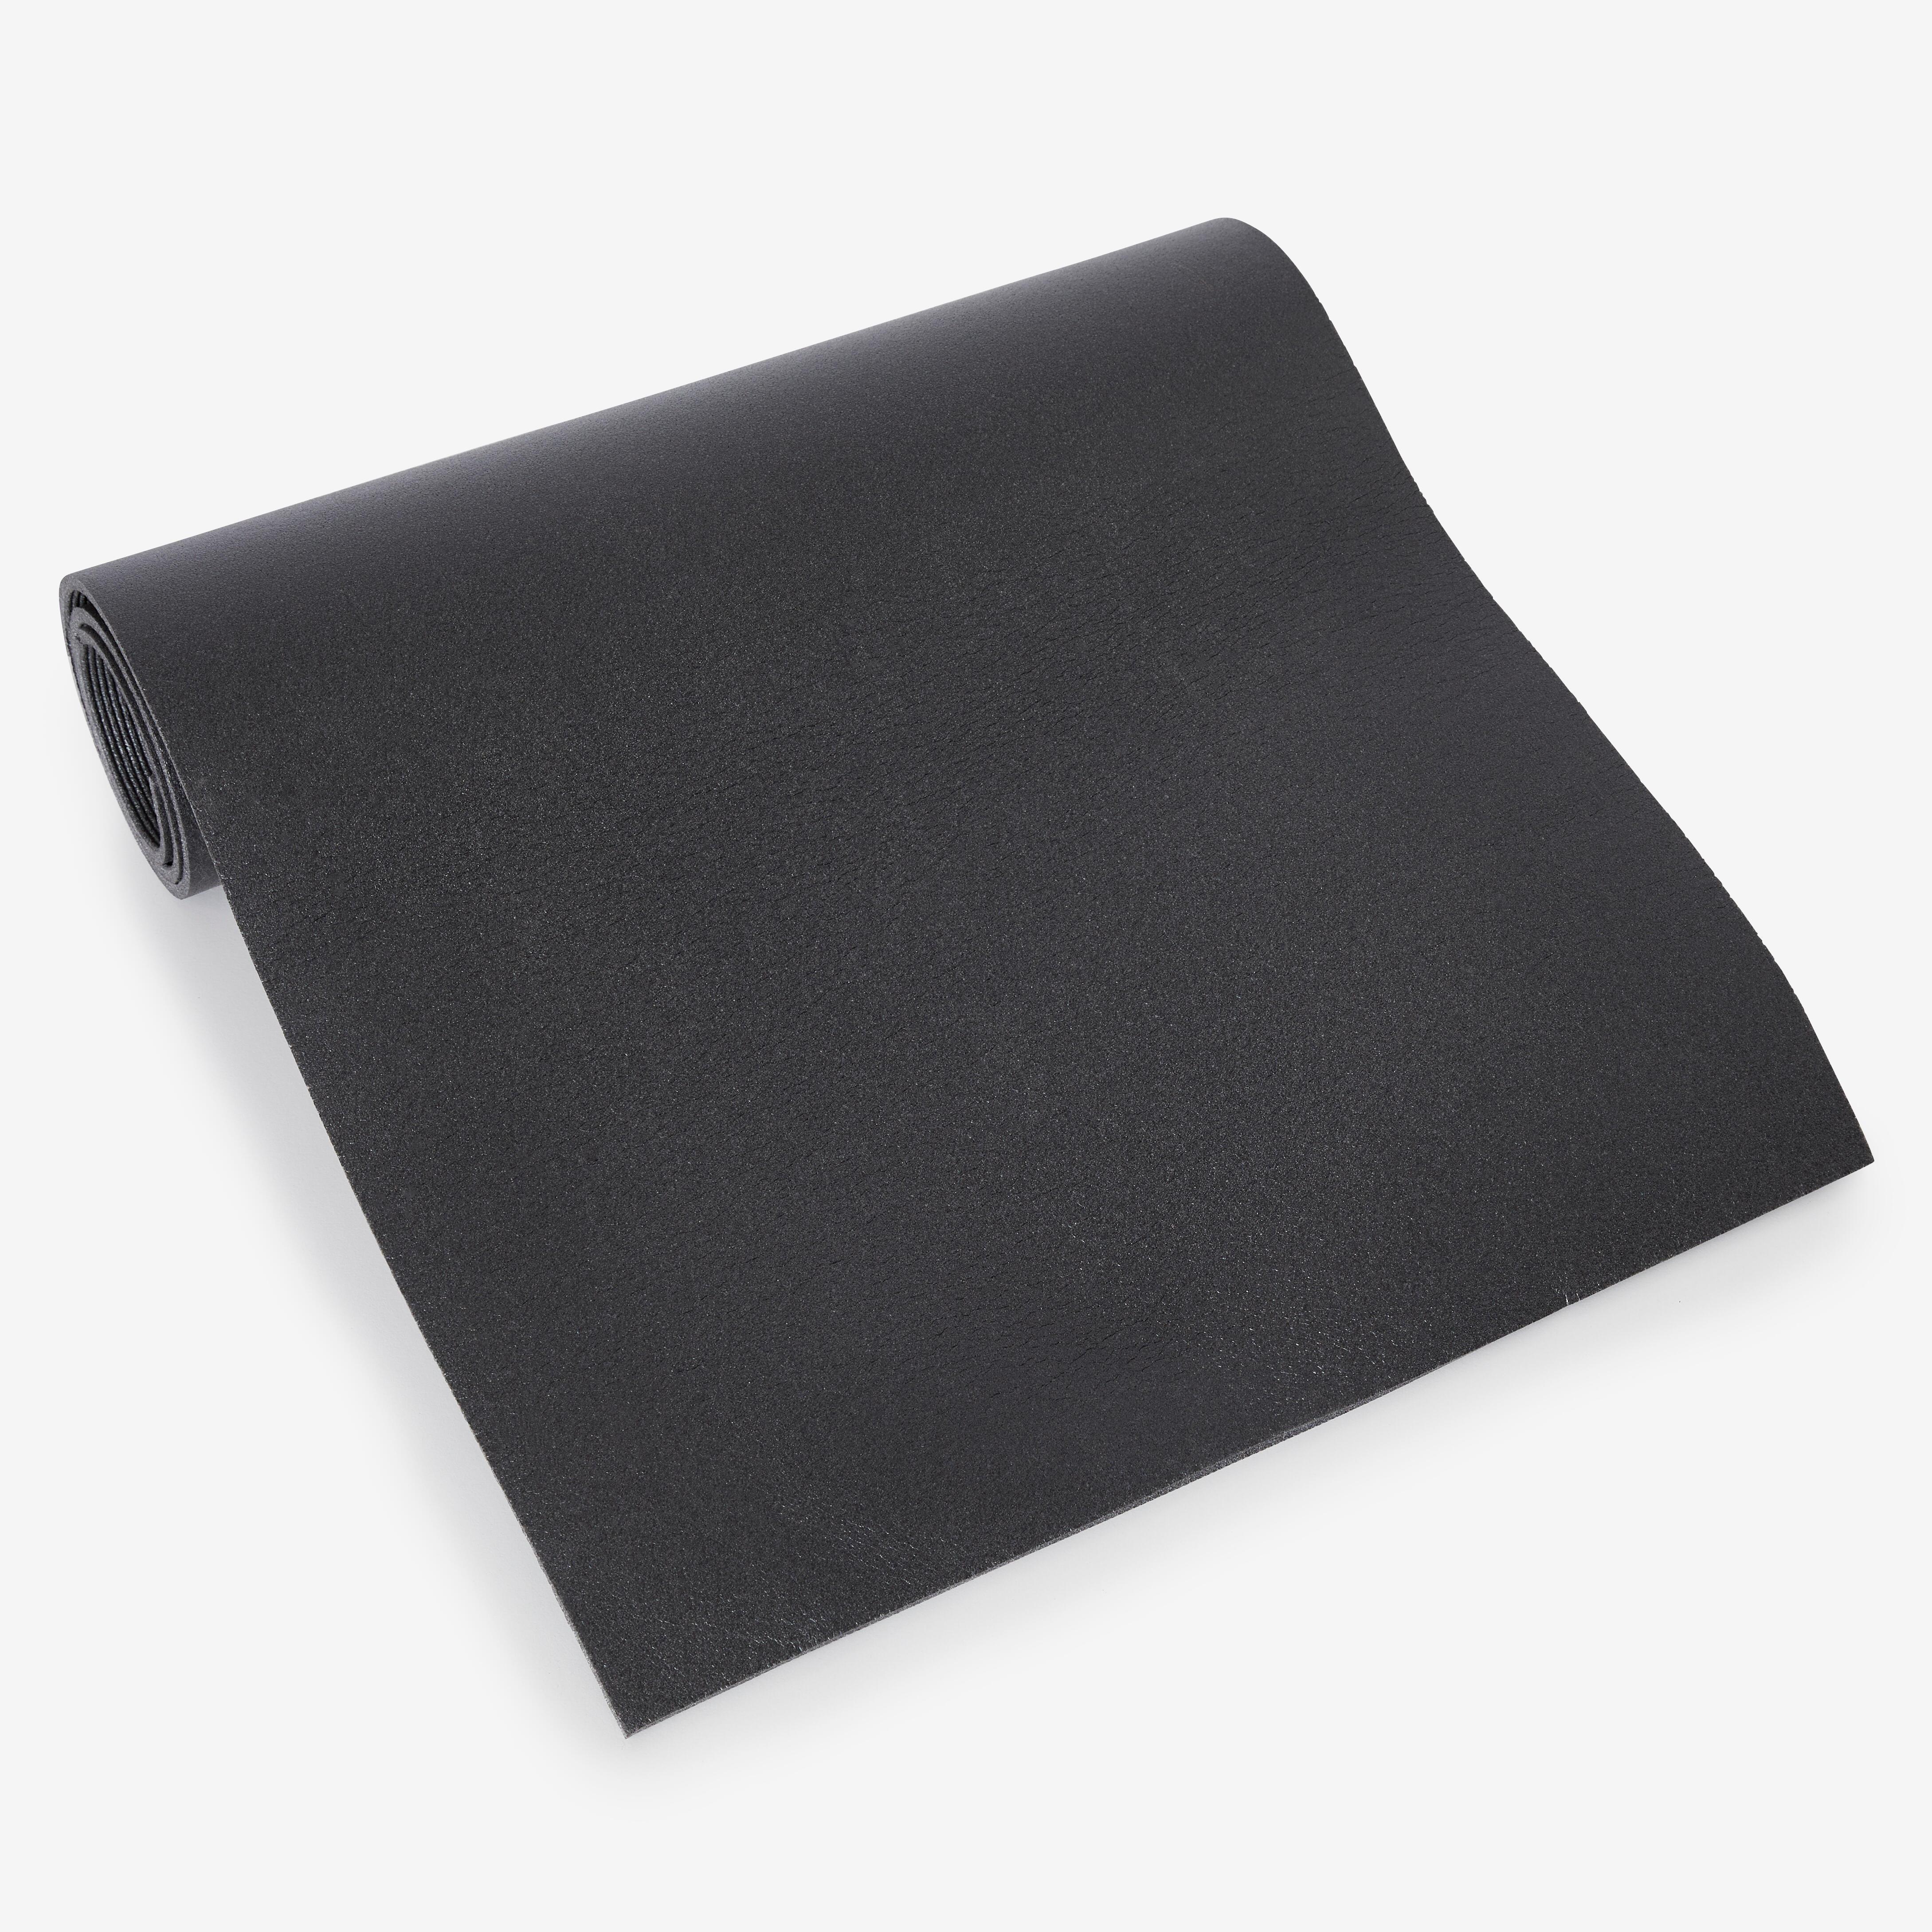 Fitnessmatte 140cm×50cm×6,5mm schwarz